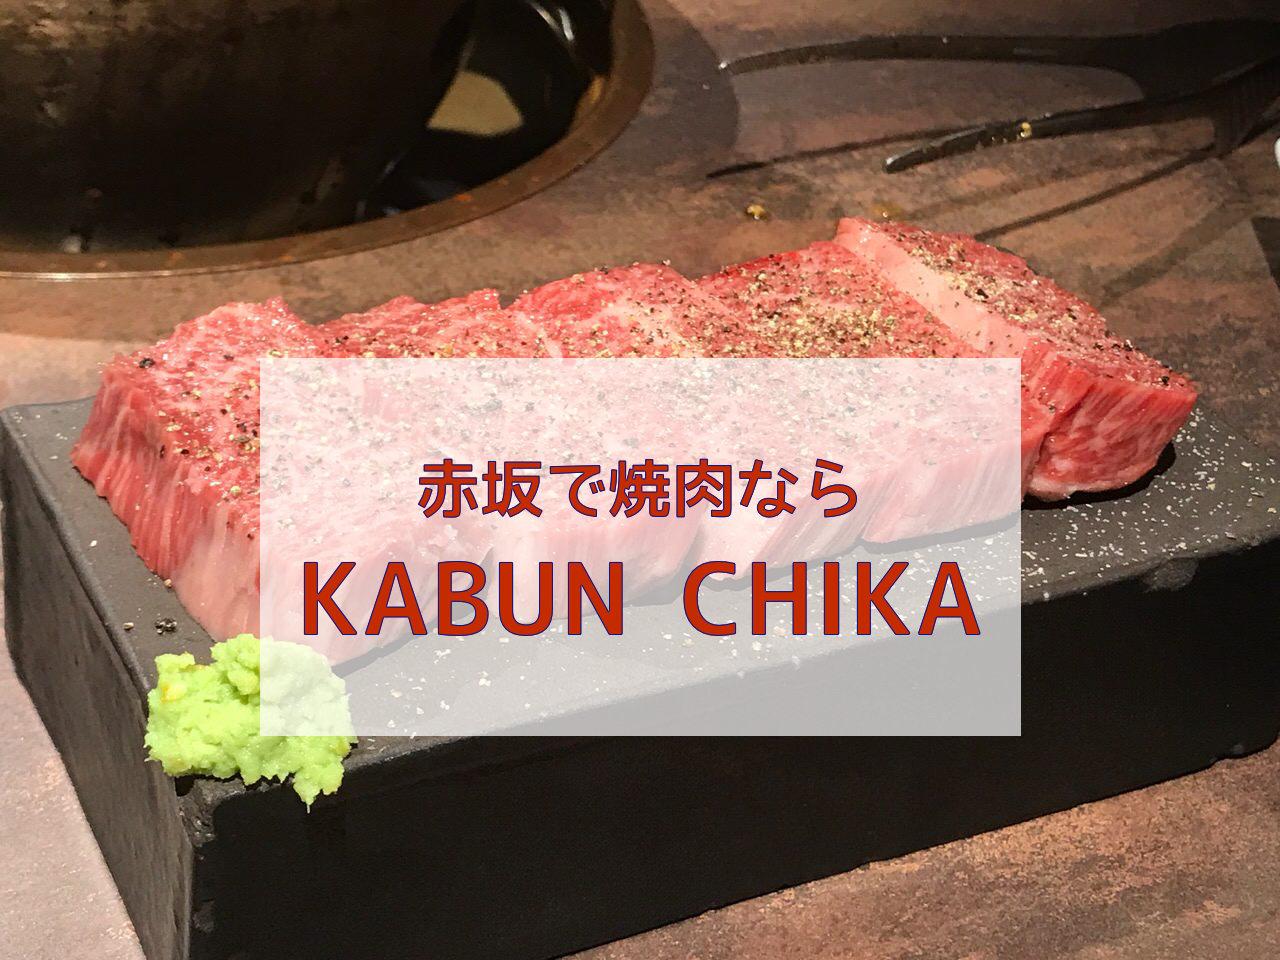 「KABUN CHIKA(カブンチカ)」何を食べても旨い赤坂でオススメのホルモン焼肉店